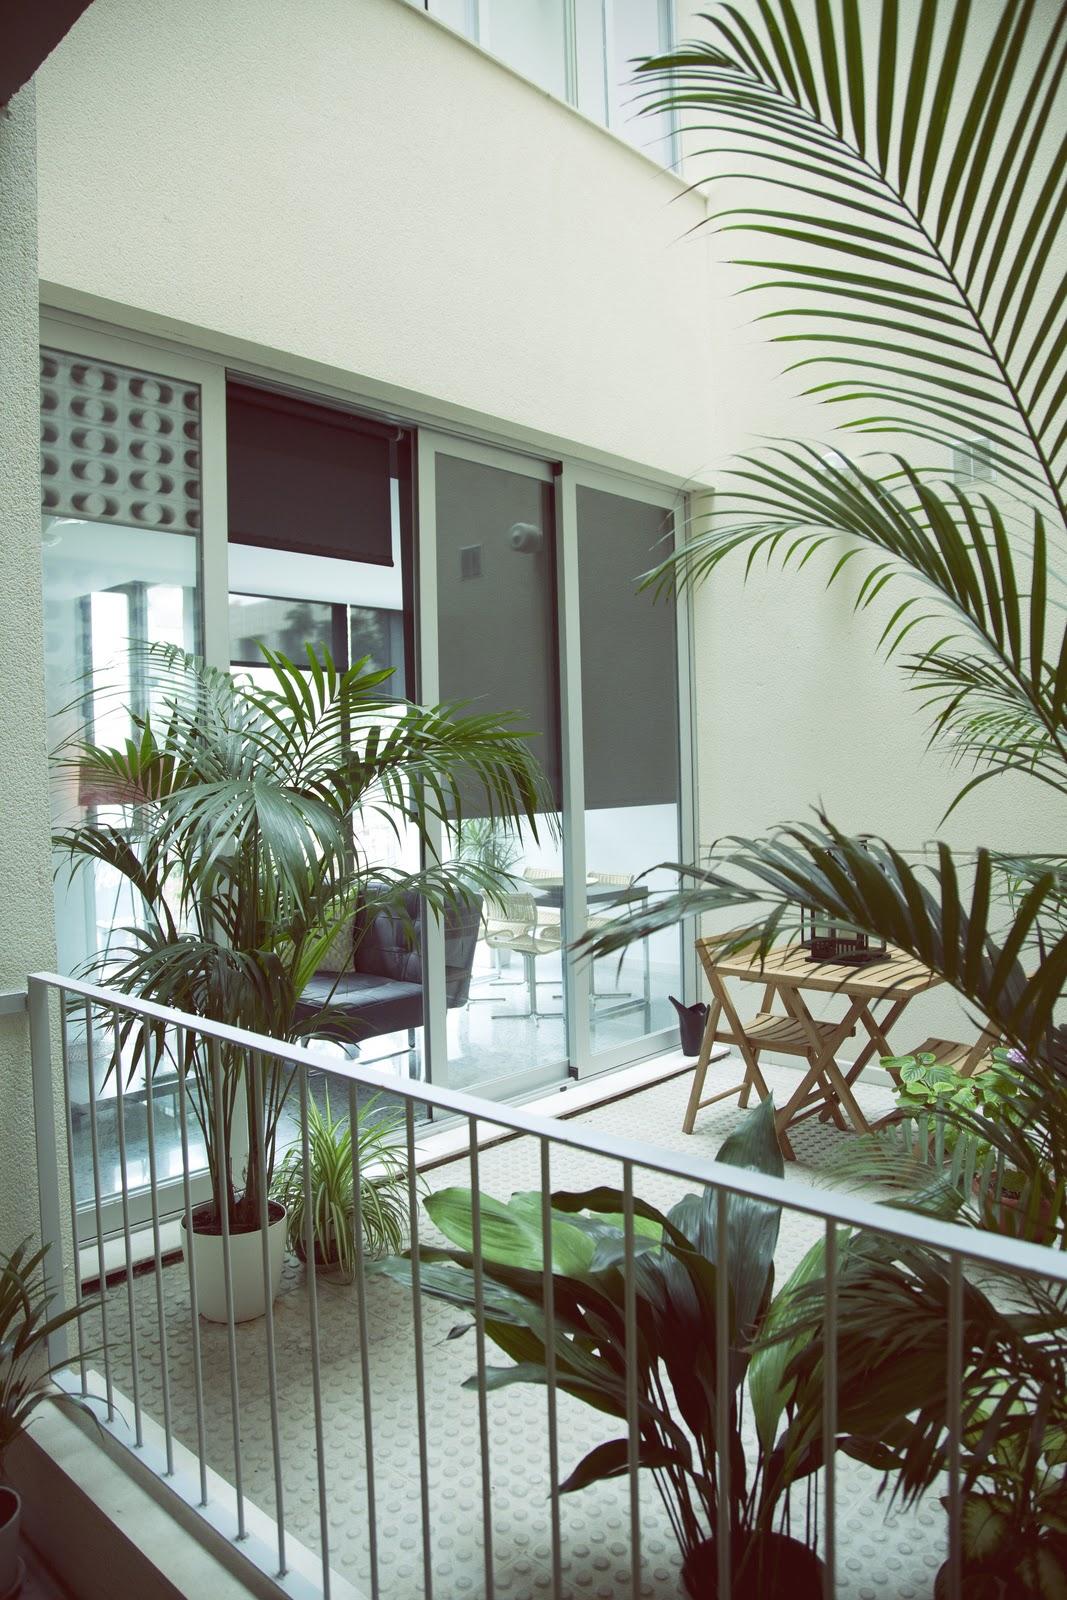 Proyecto de interiorismo detalles dg arquitecto valencia - Interiorismo valencia ...